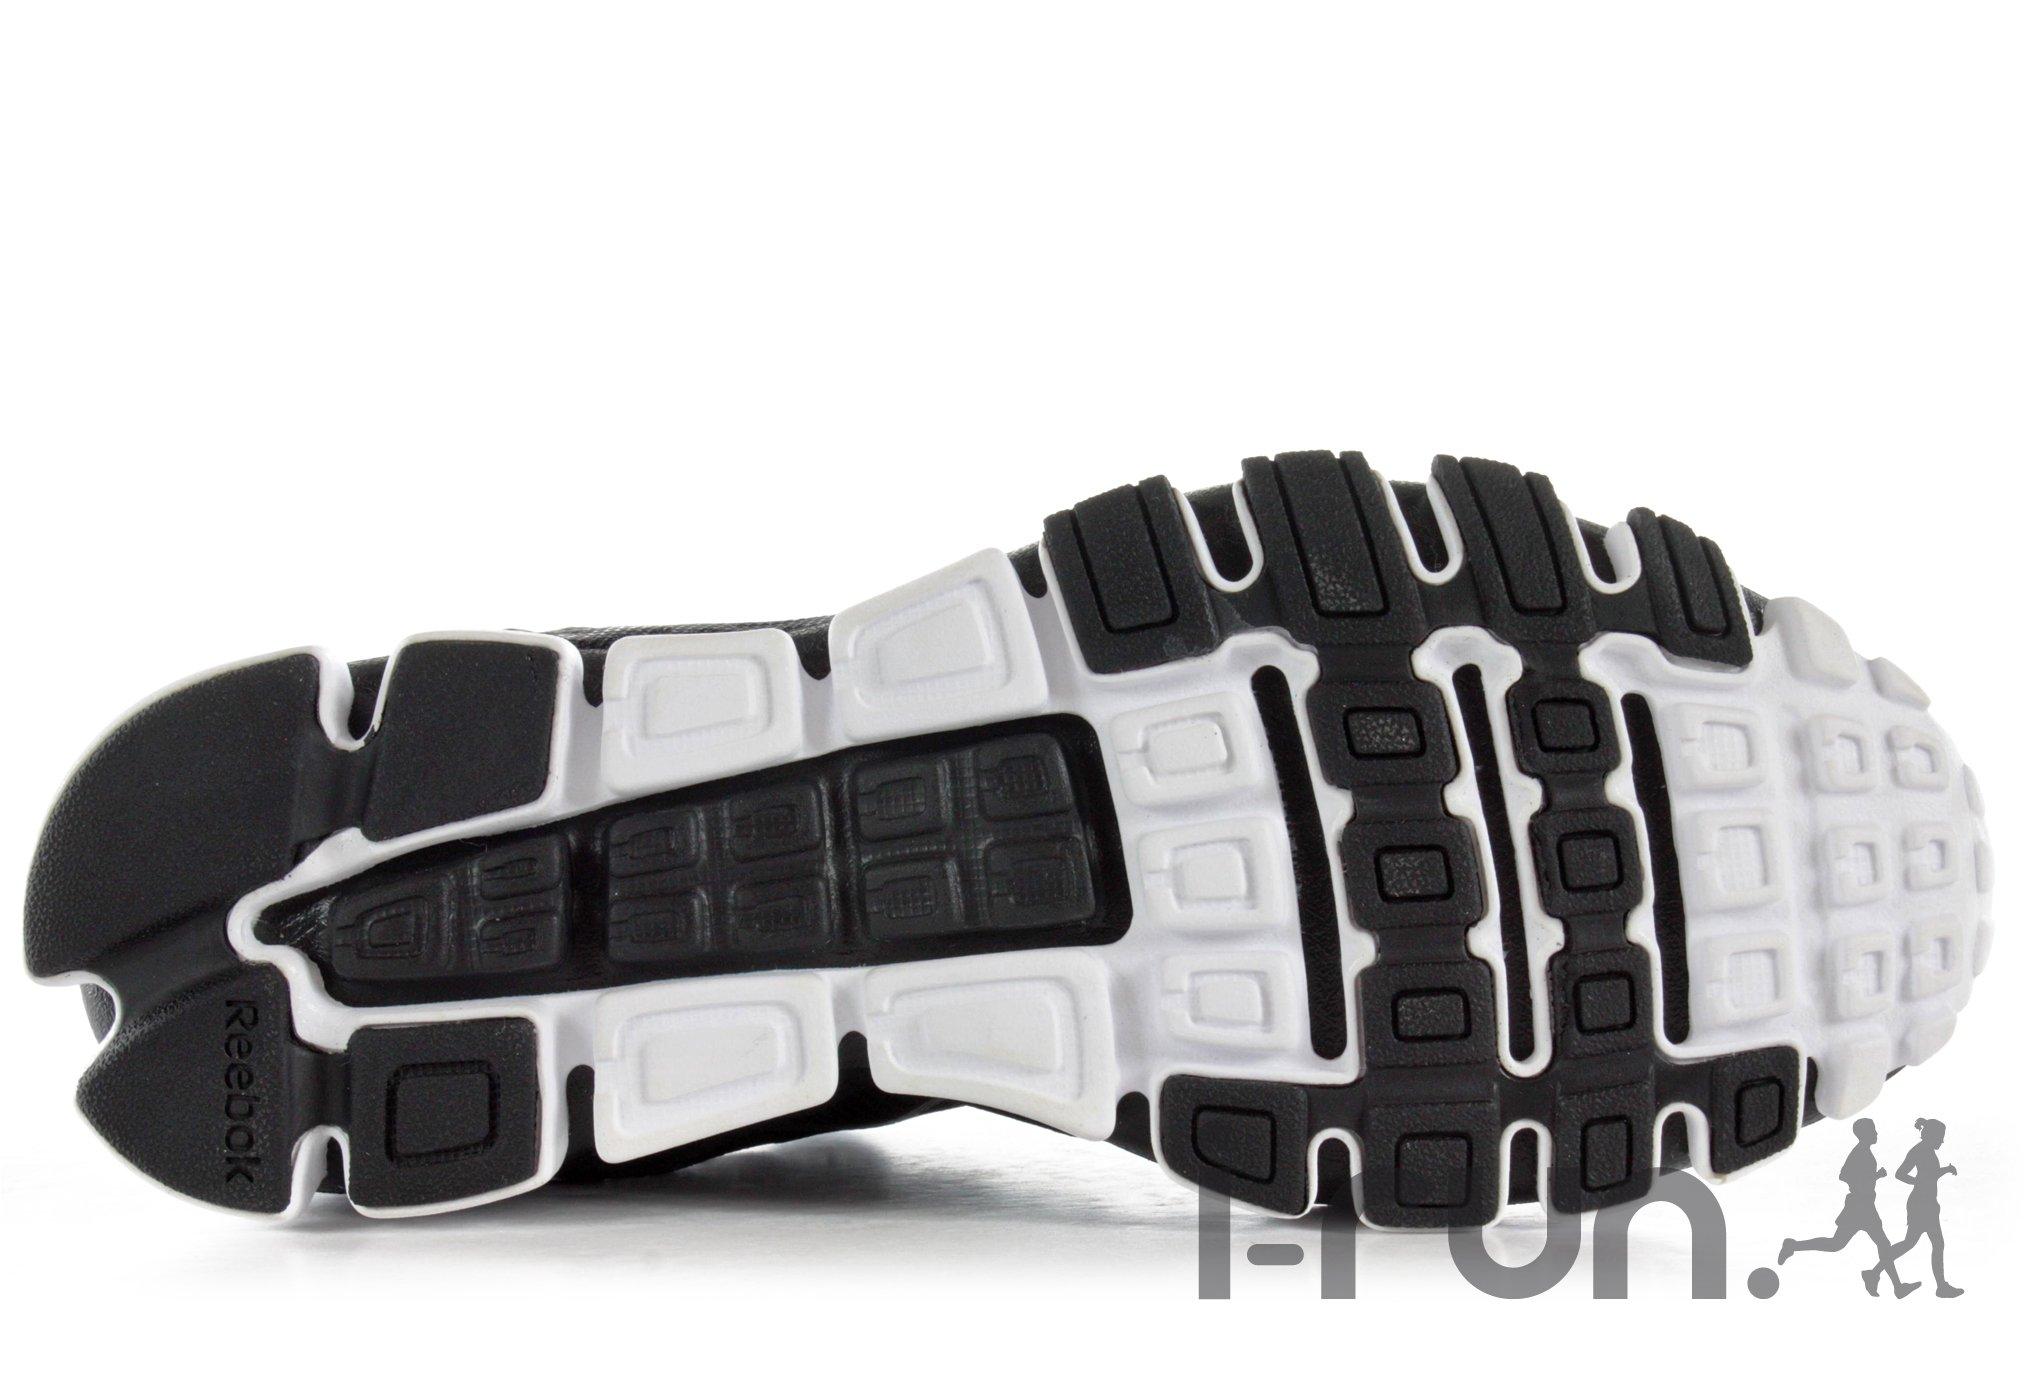 Reebok RealFlex Transition 4.0 M pas cher - Chaussures